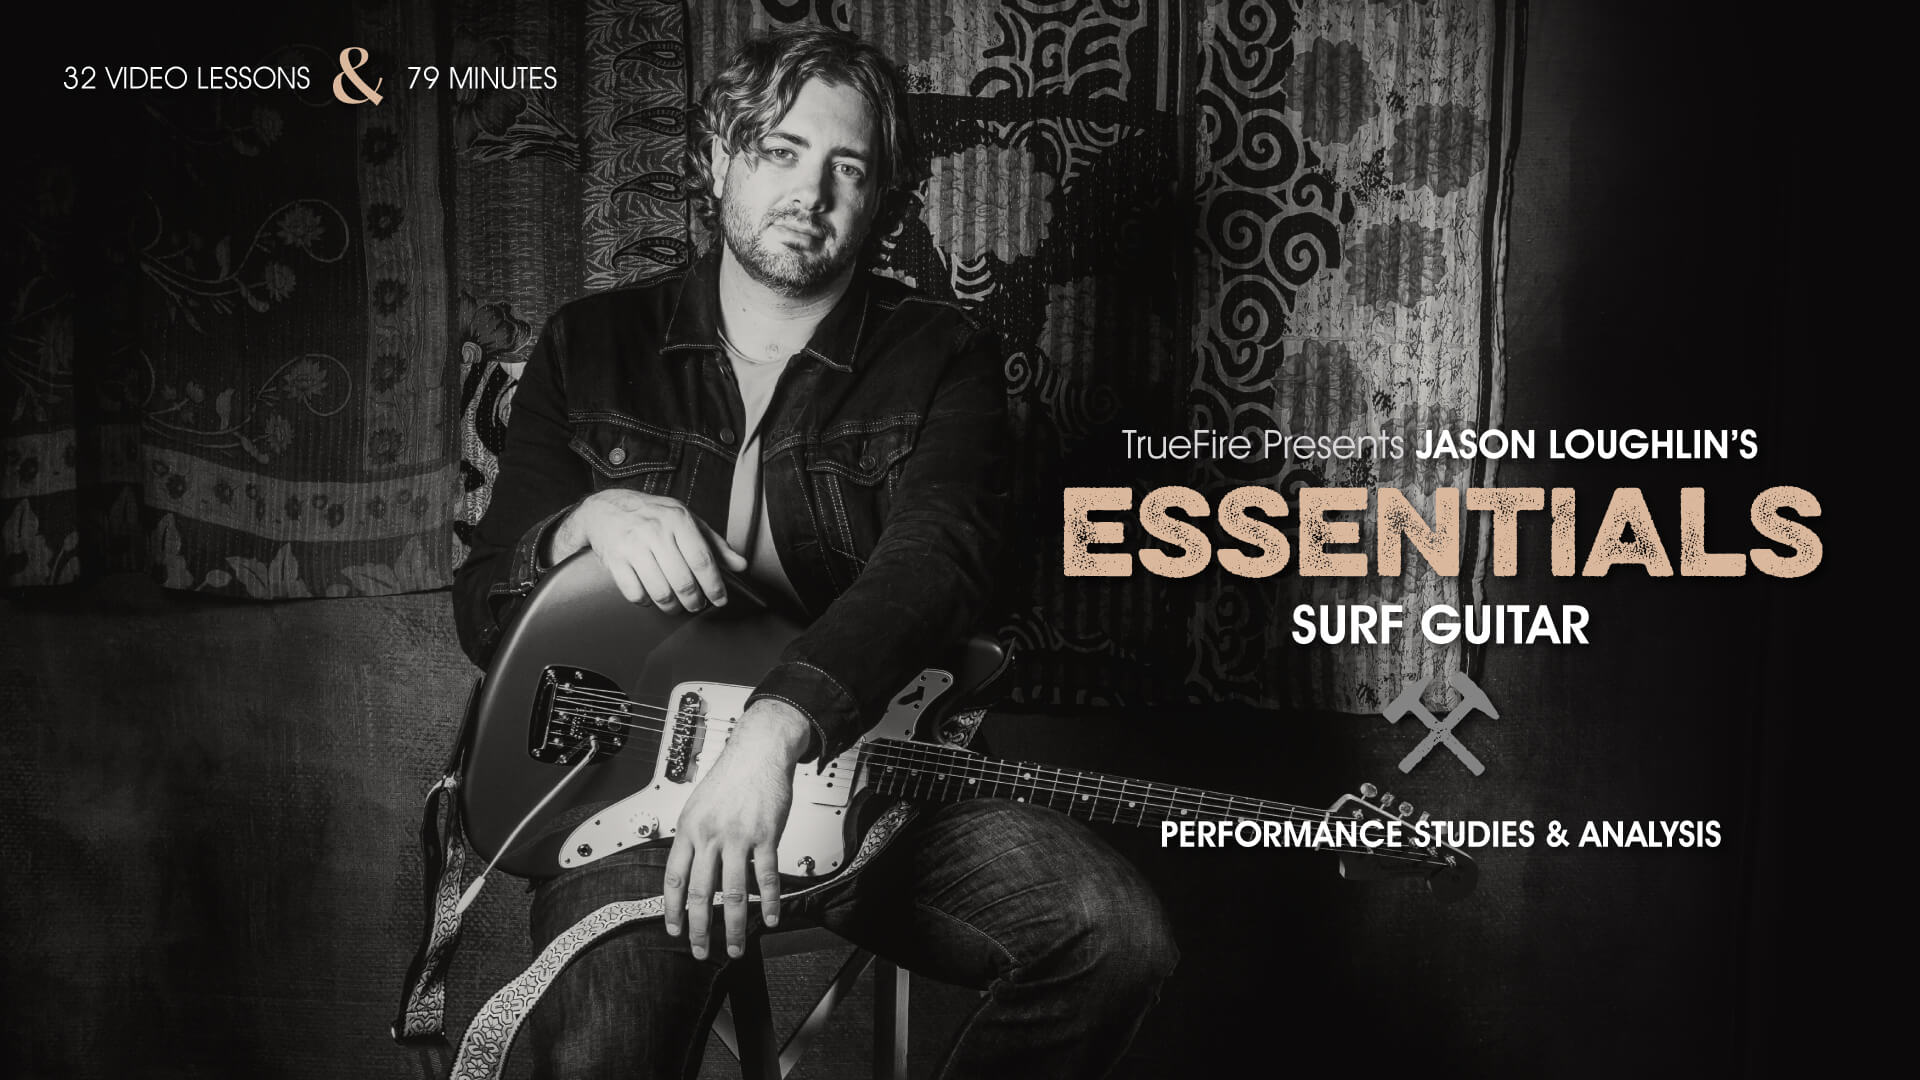 Surf Guitar Lessons Jason Loughlin Truefire